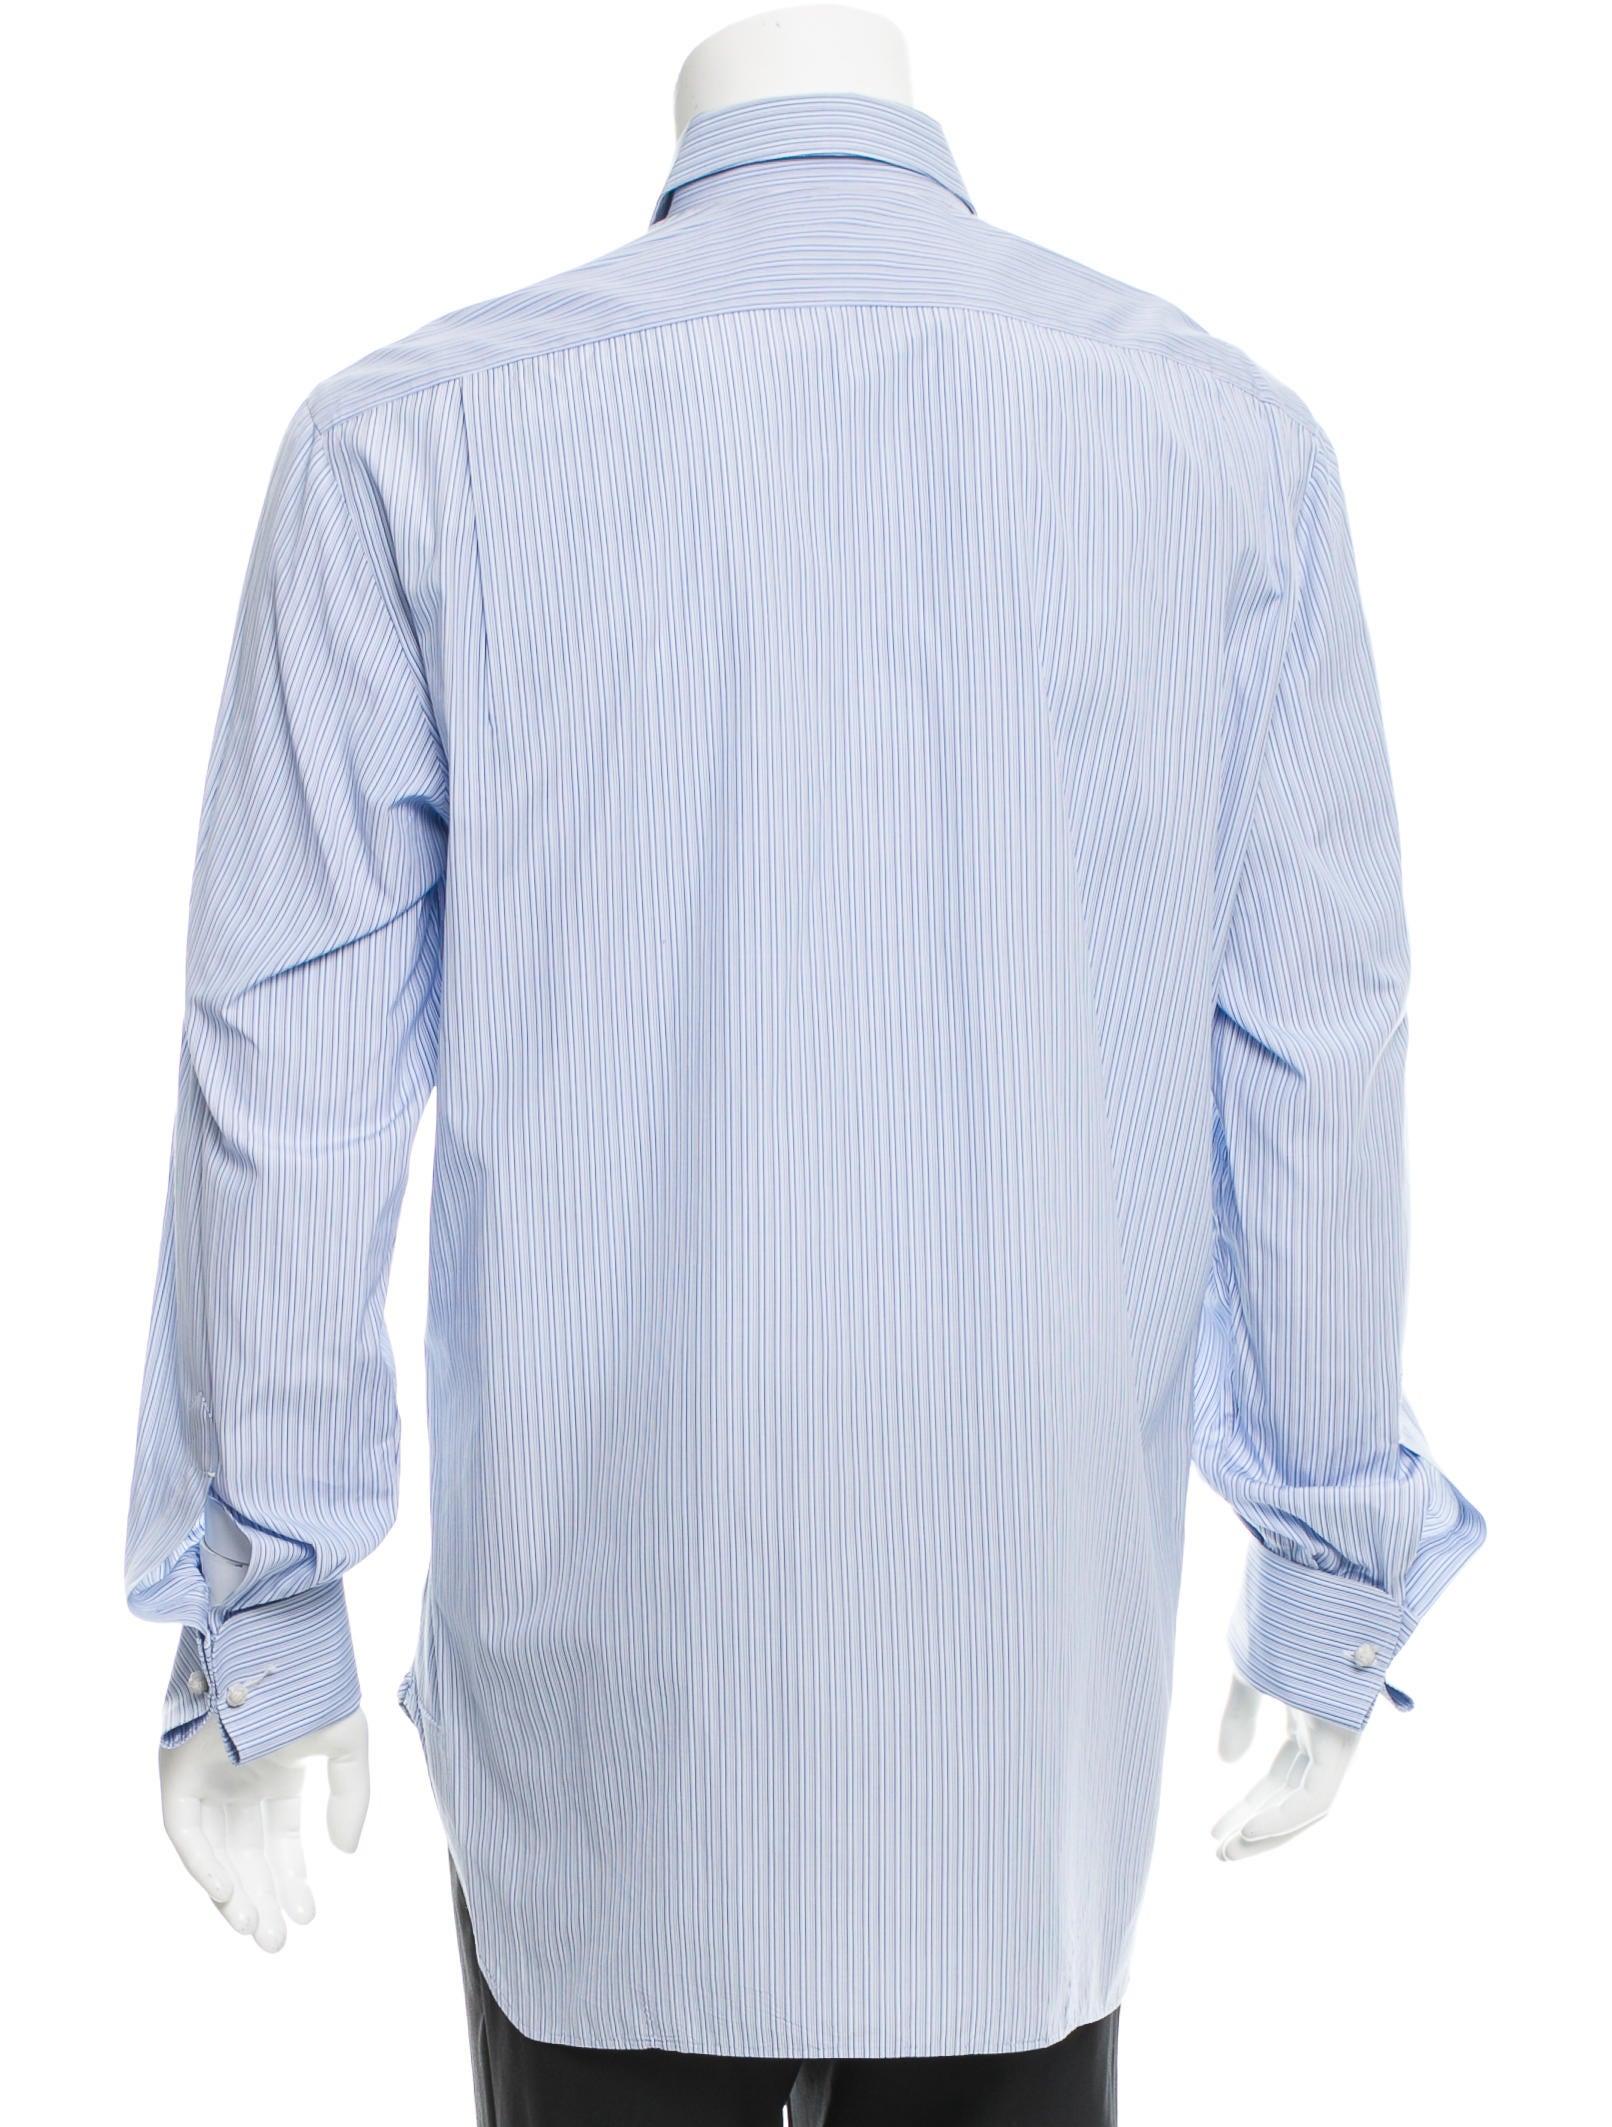 Kiton striped button up shirt clothing kit21333 the for Striped button up shirt mens